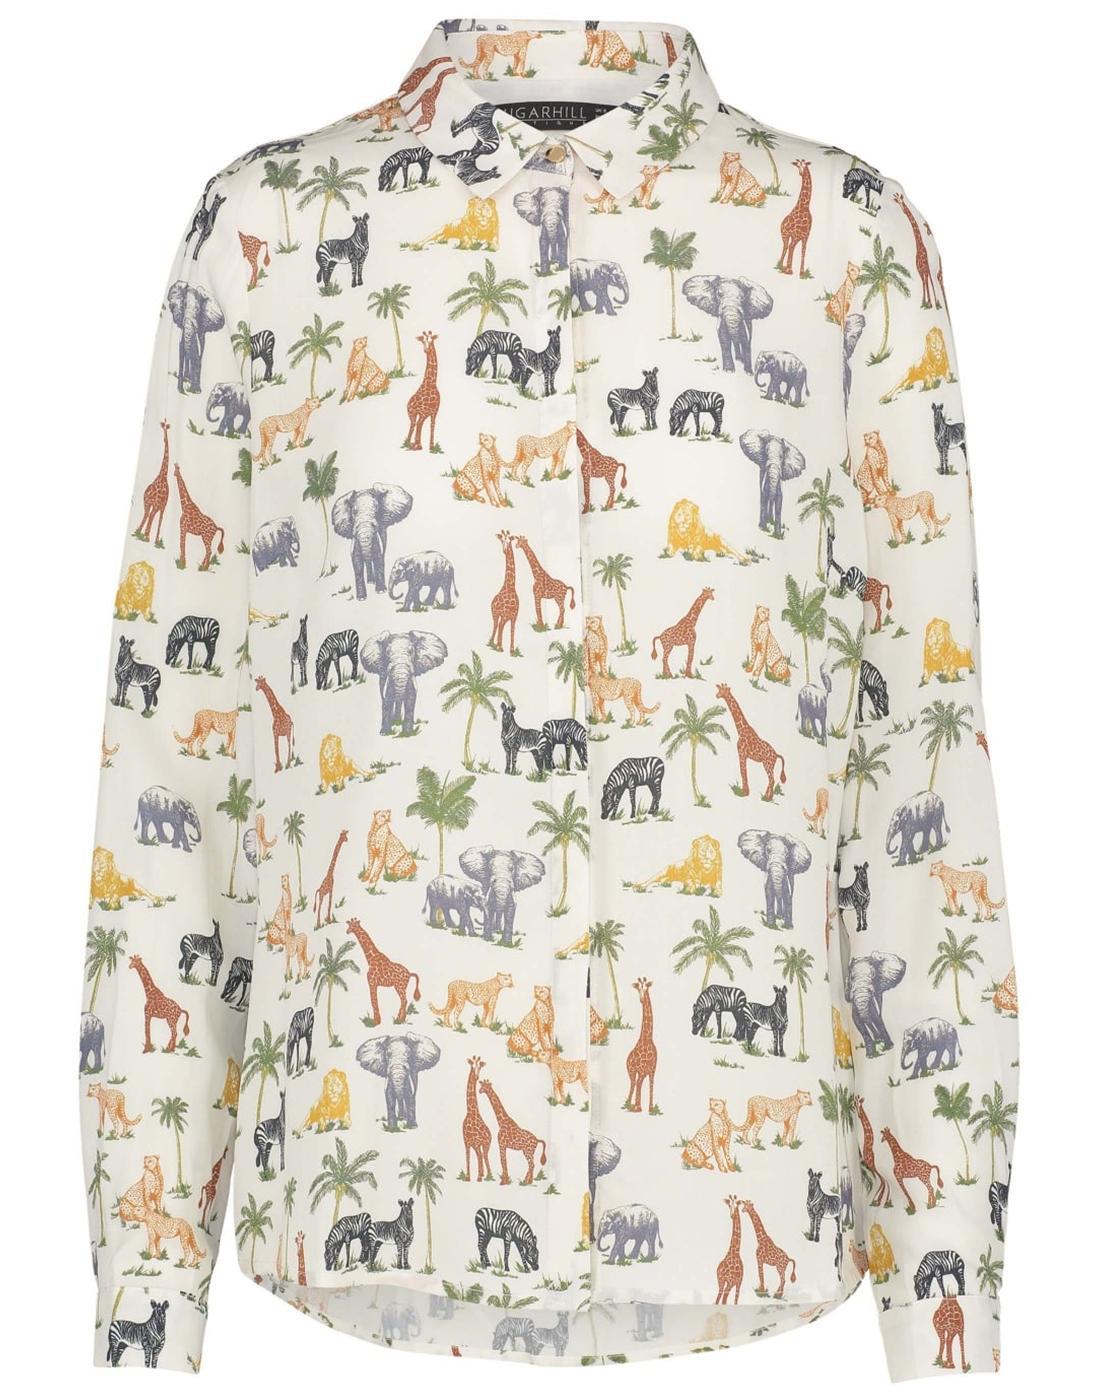 Blair SUGARHILL BOUTIQUE Retro Wild Animal Shirt